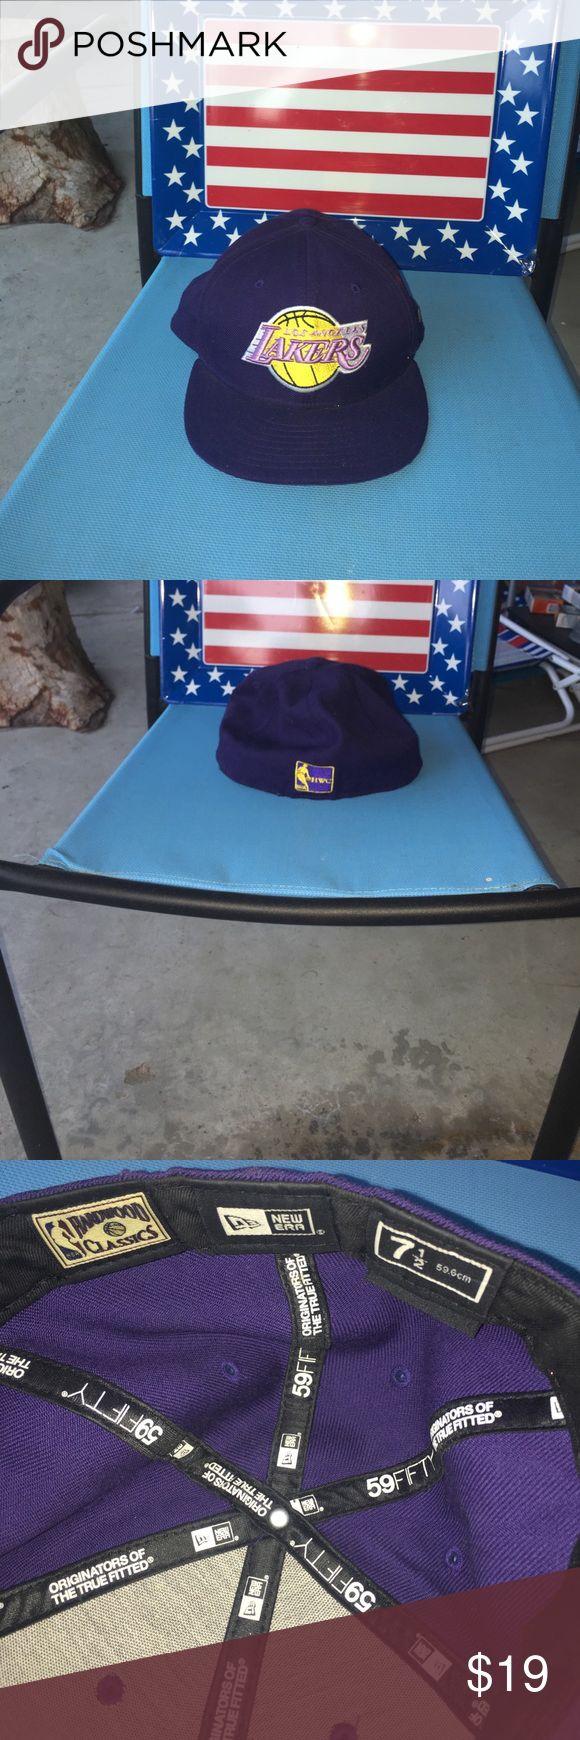 NWOT NEW ERA Hardwood Classics Lakers Hat Purple and Gold Lakers hat, NEW ERa flex fit size 71/2 New Era Accessories Hats